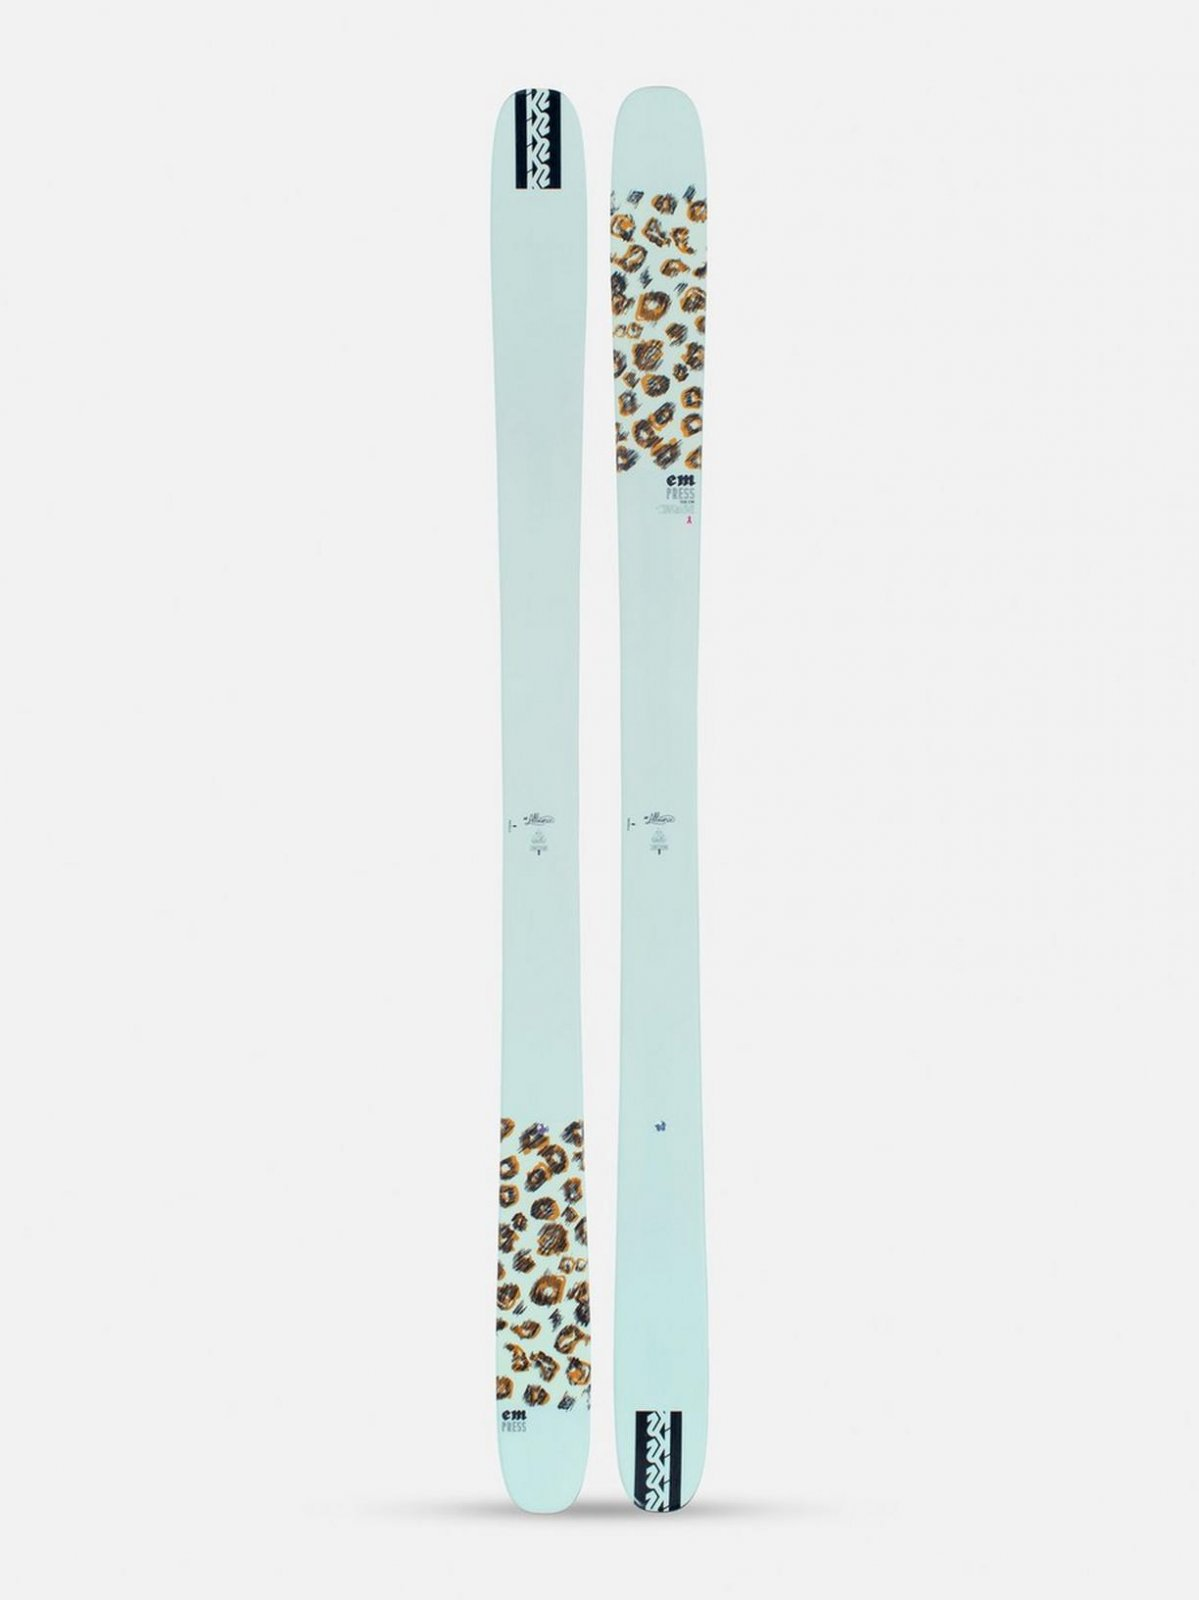 2021 K2 Empress Women's Skis